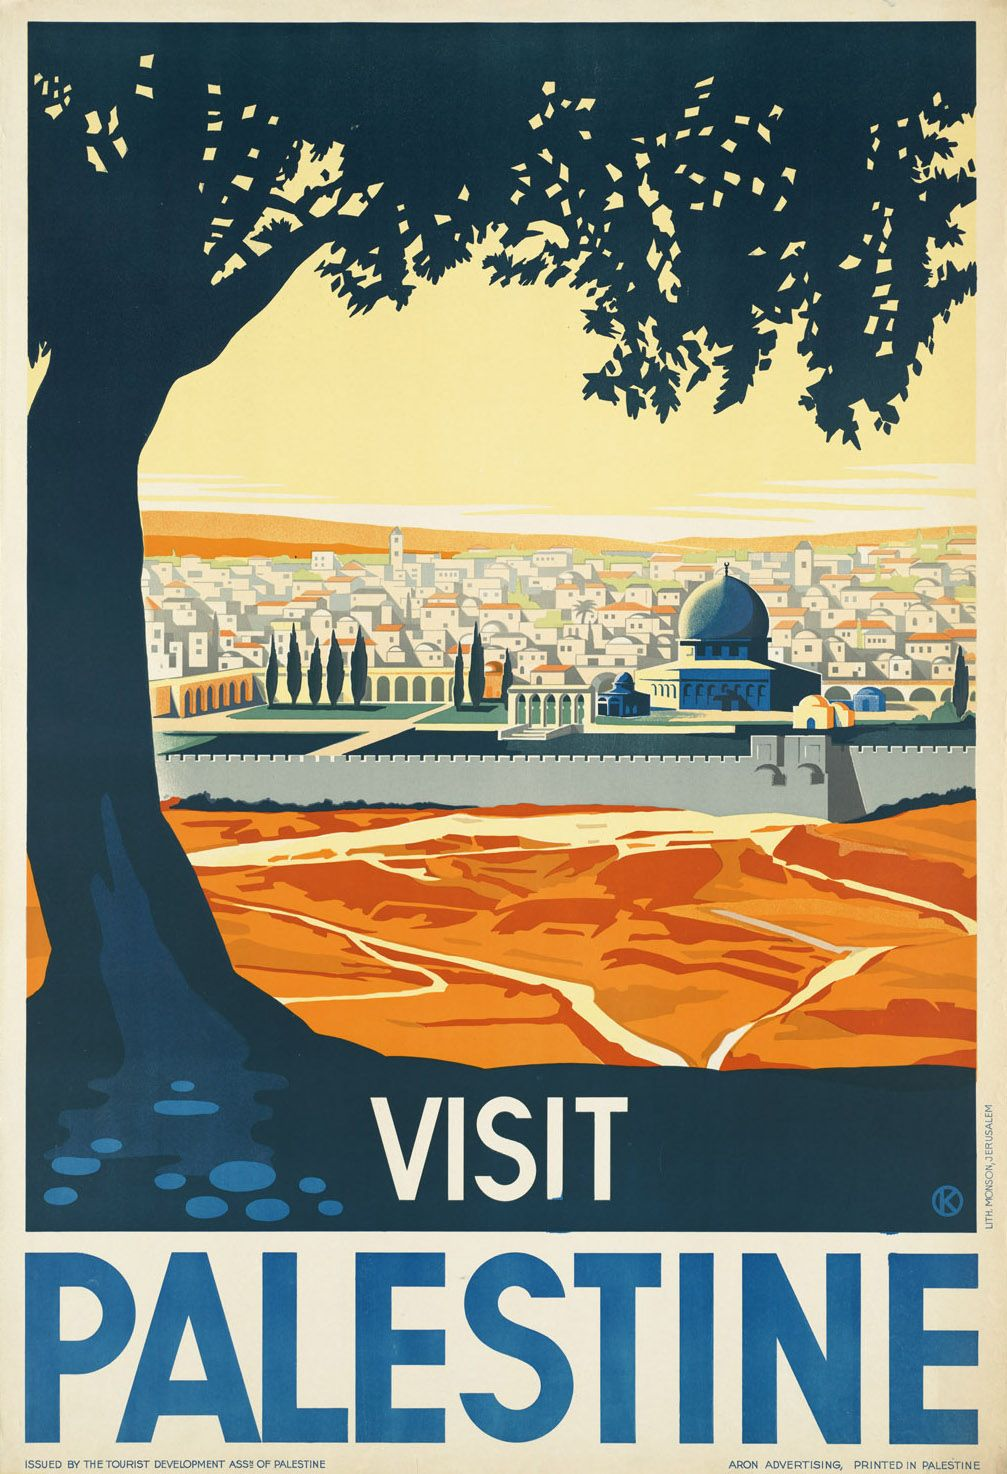 Visit Palestine | Posters | Pinterest | Travel posters, Palestine ...